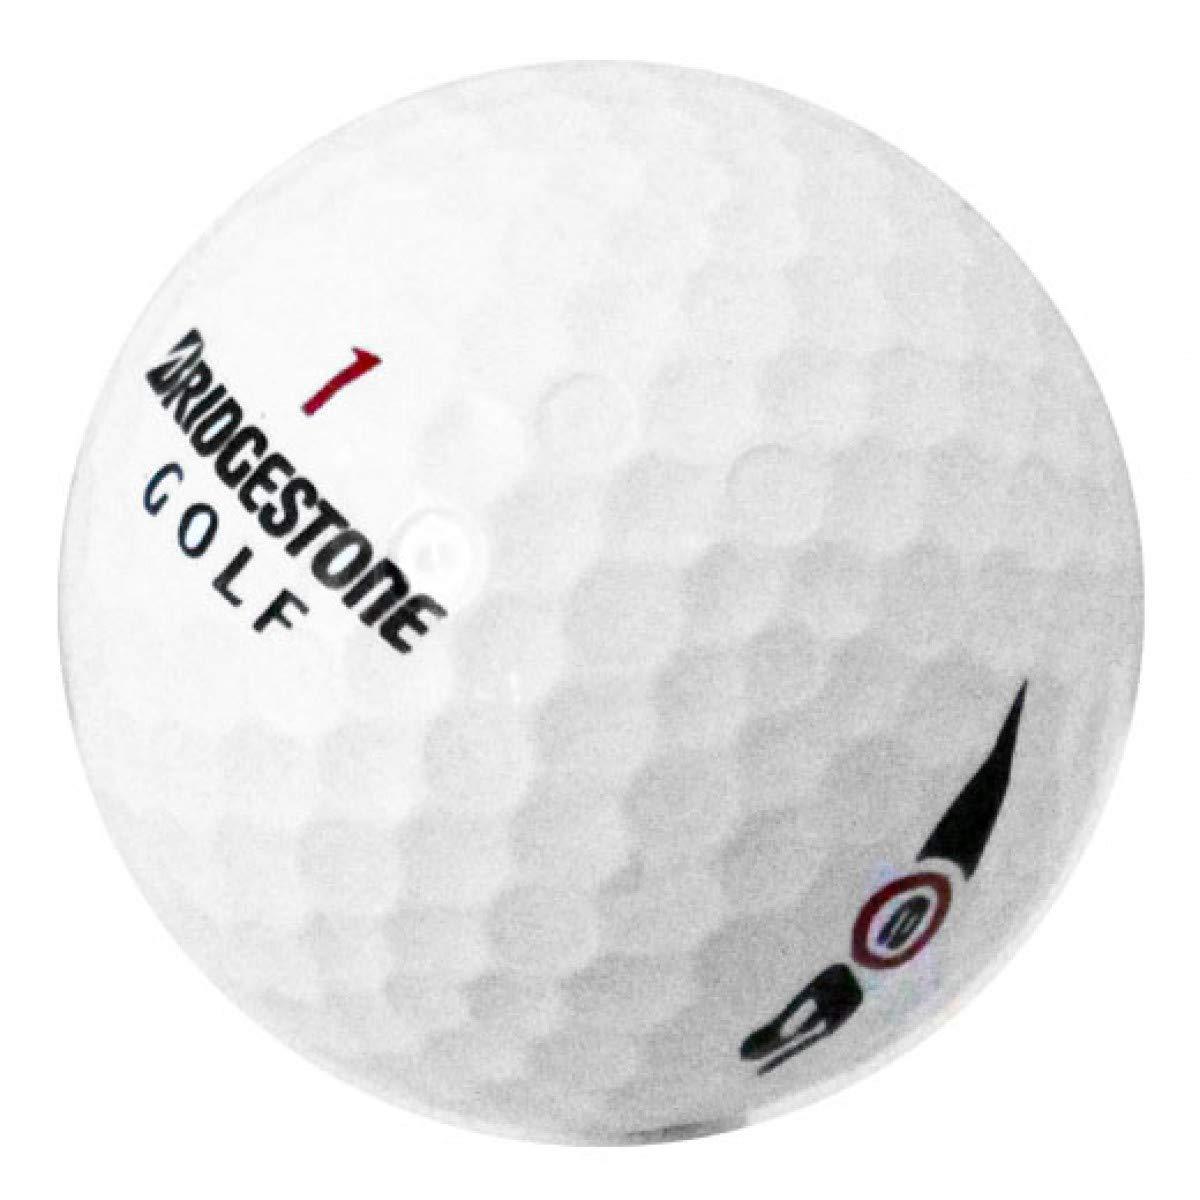 Bridgestone e6 Golf Balls - 36 Used Golf Balls by Bridgestone